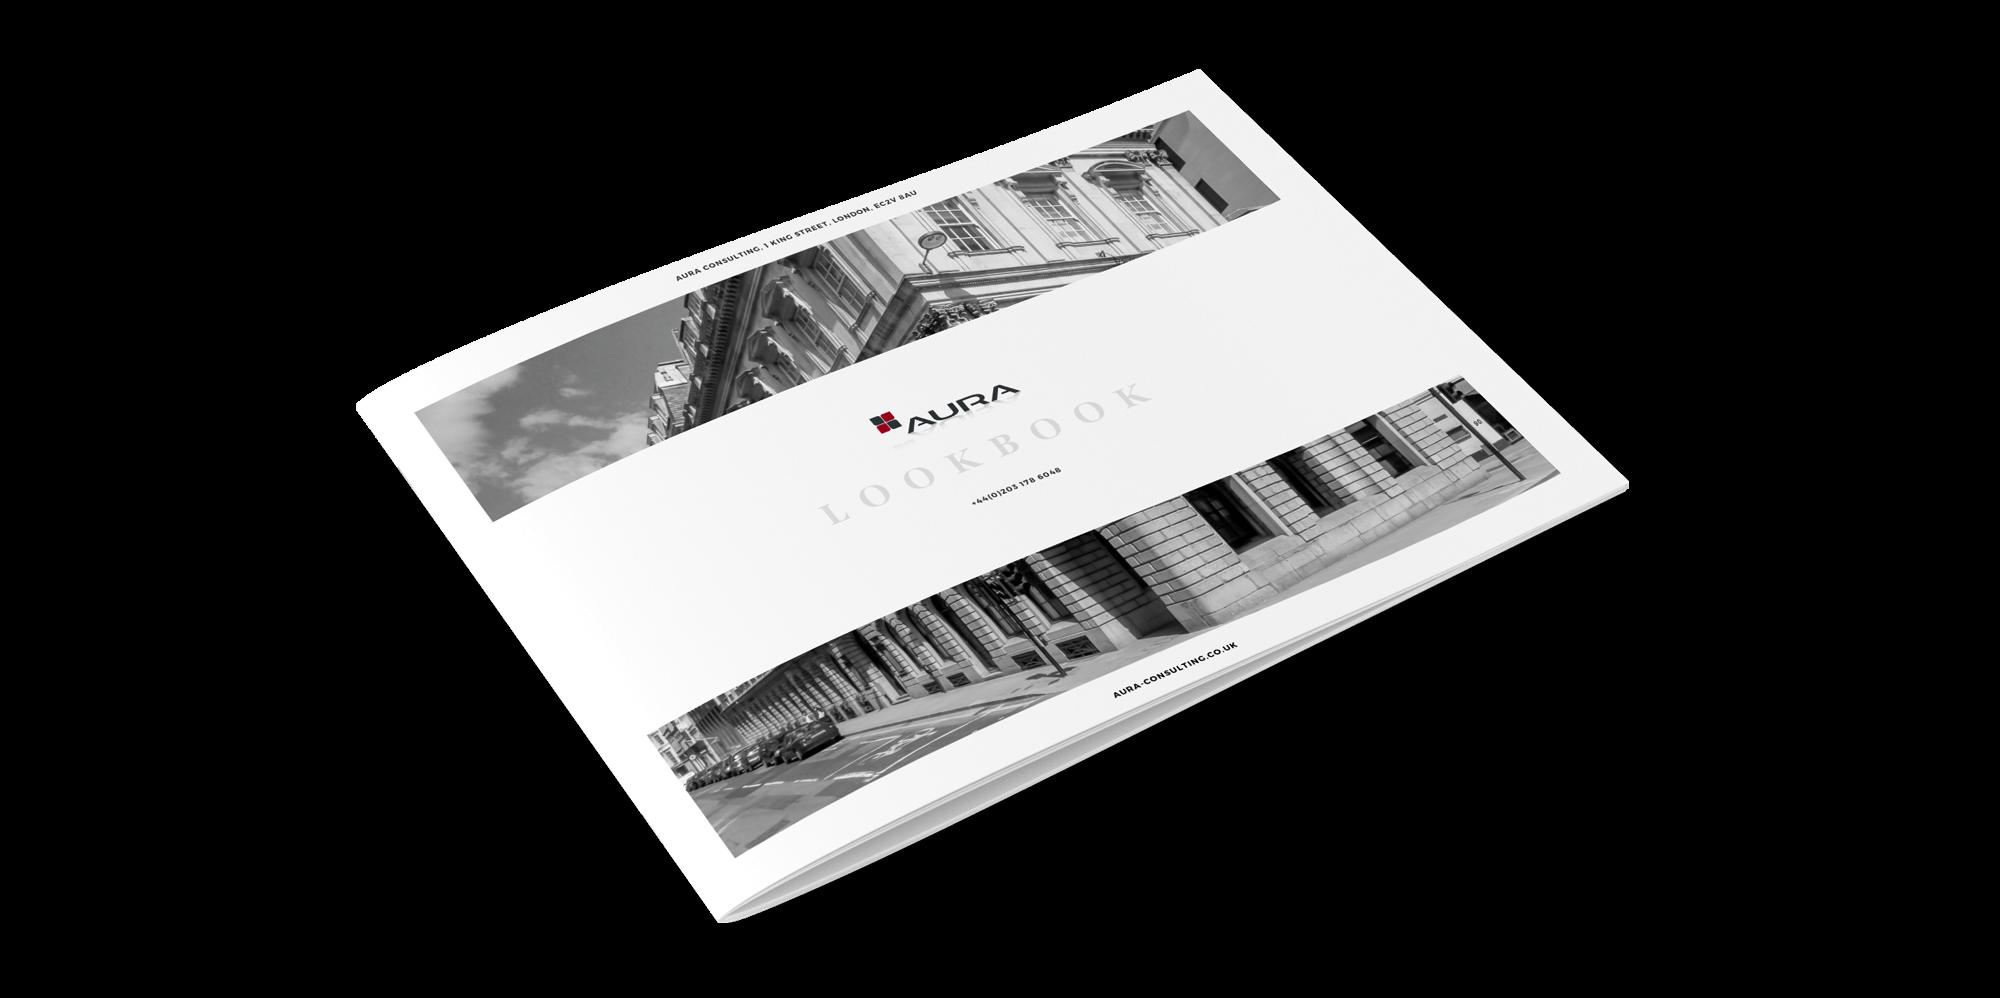 aura-brochure-mockup-cover-2